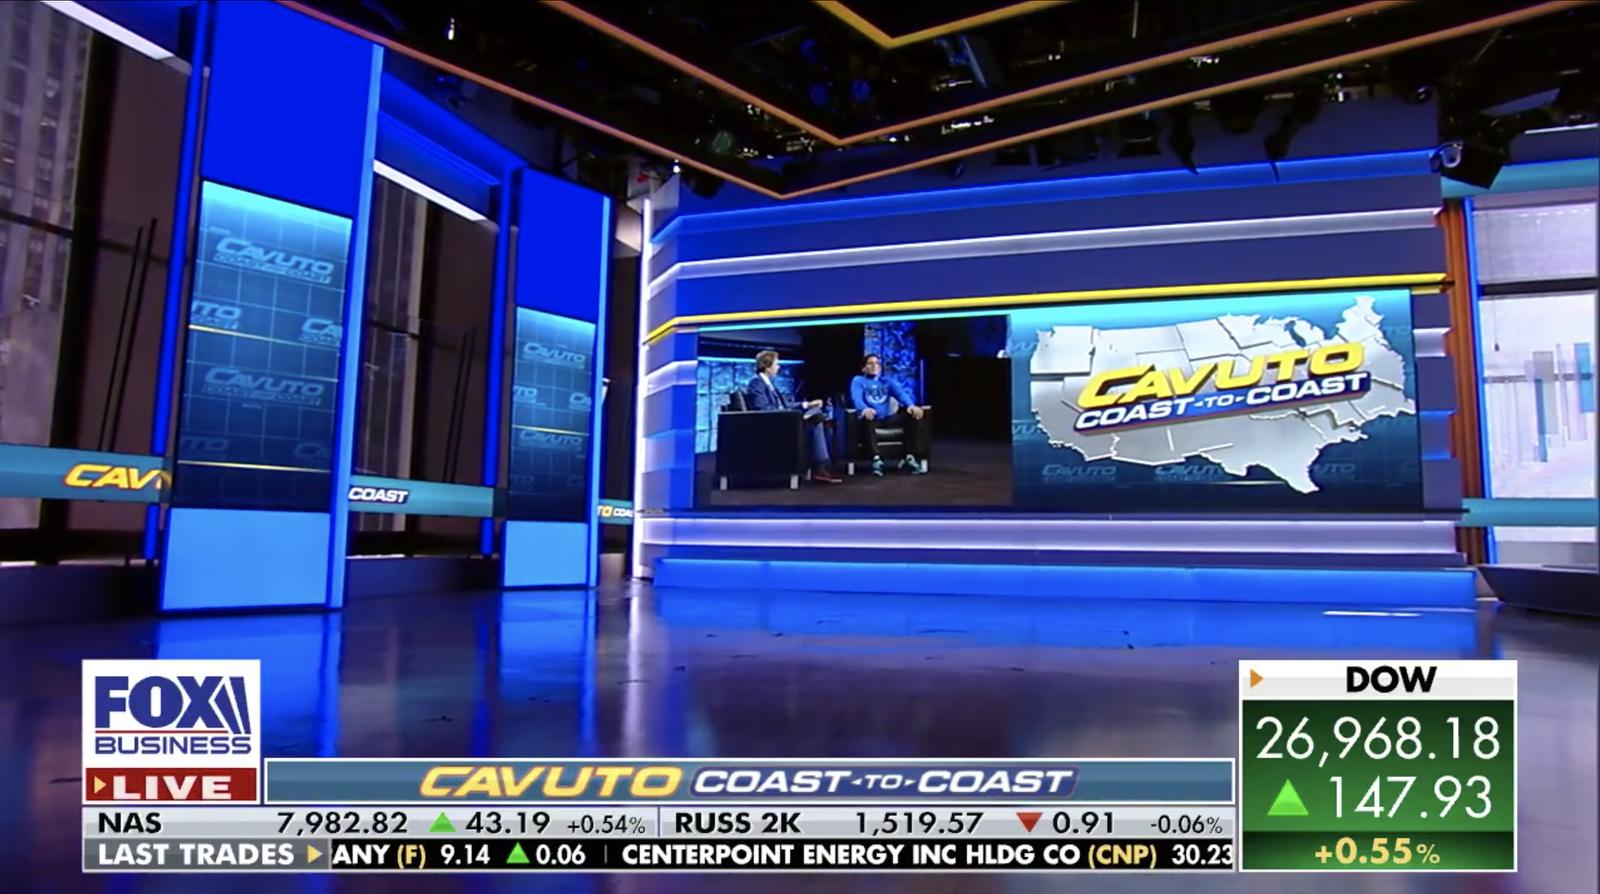 NCS_Fox-Business_Cavuto-Coast-to-Coast_Motion-Graphics_001